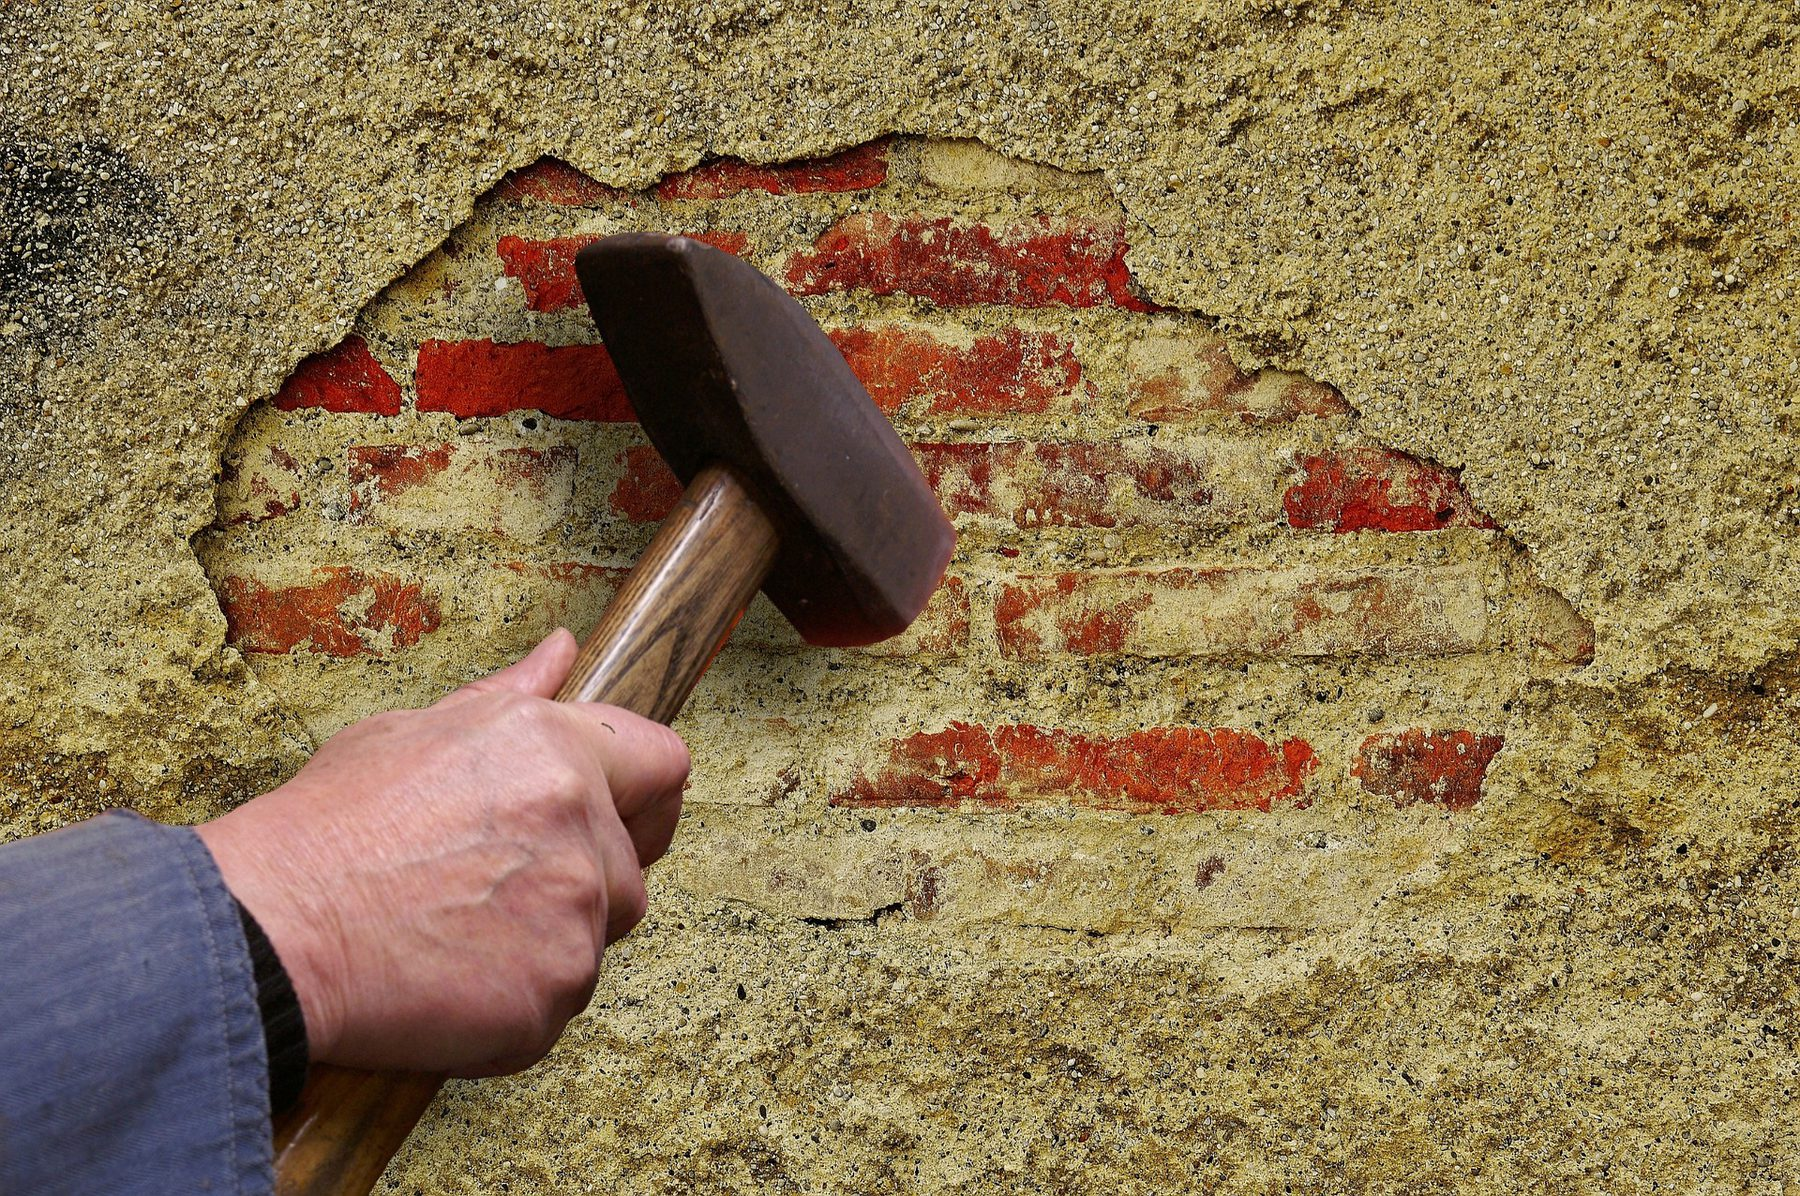 Job Role Image (Plasterer: Hammer Chipping at Plaster)